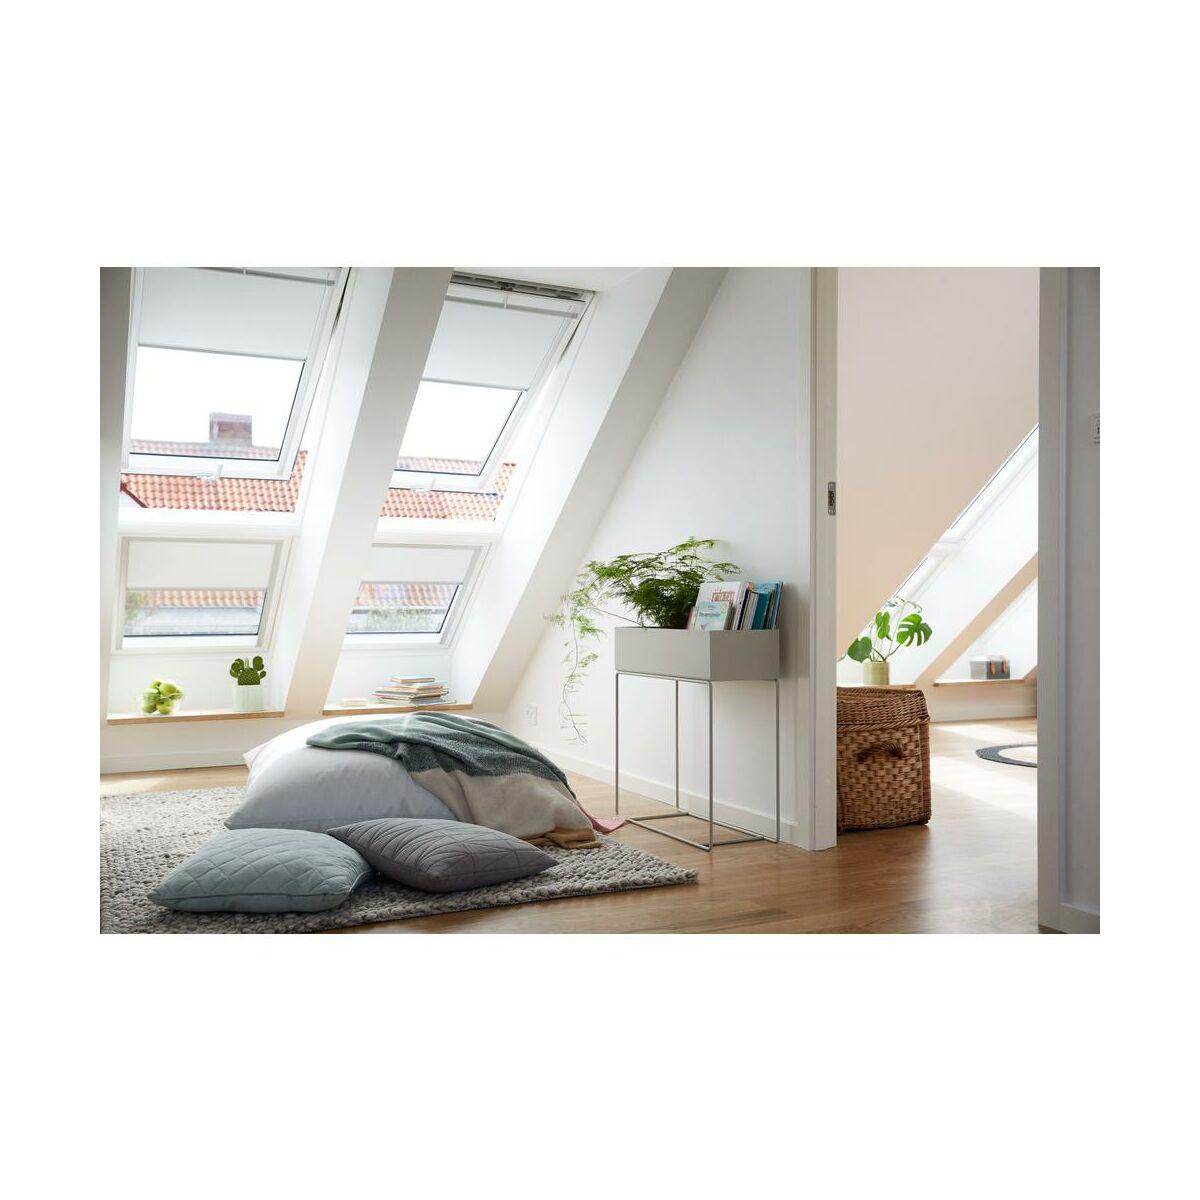 okno dachowe gpu sk06 0034 118x114 cm velux okna dachowe. Black Bedroom Furniture Sets. Home Design Ideas